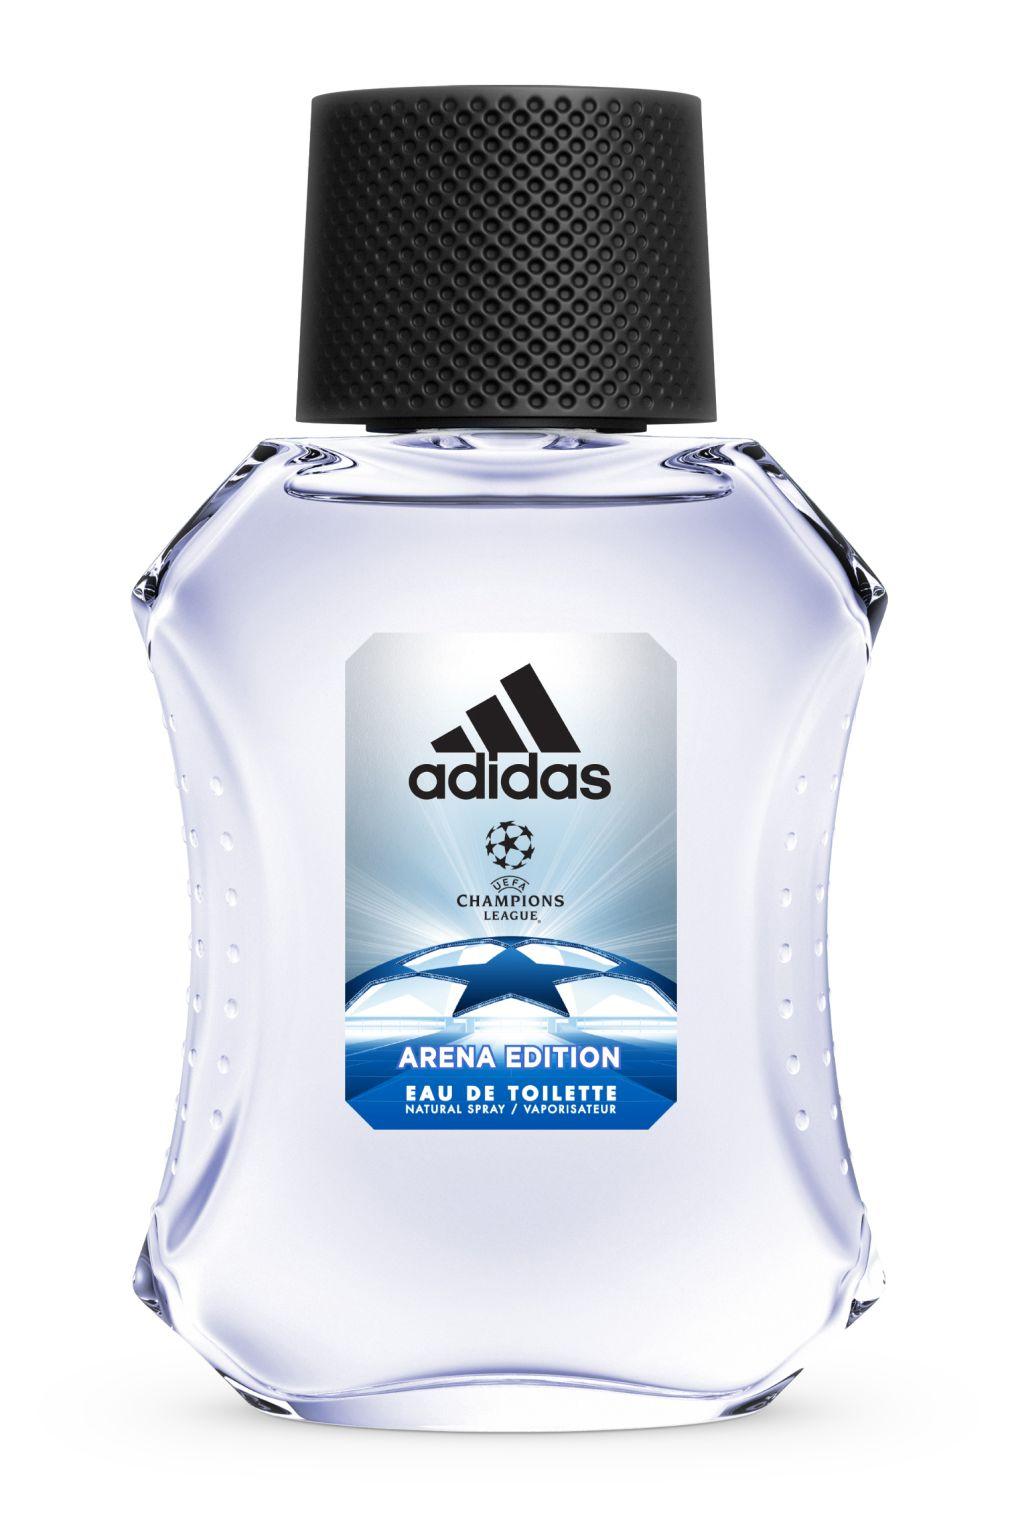 profumi adidas uomo opinioni